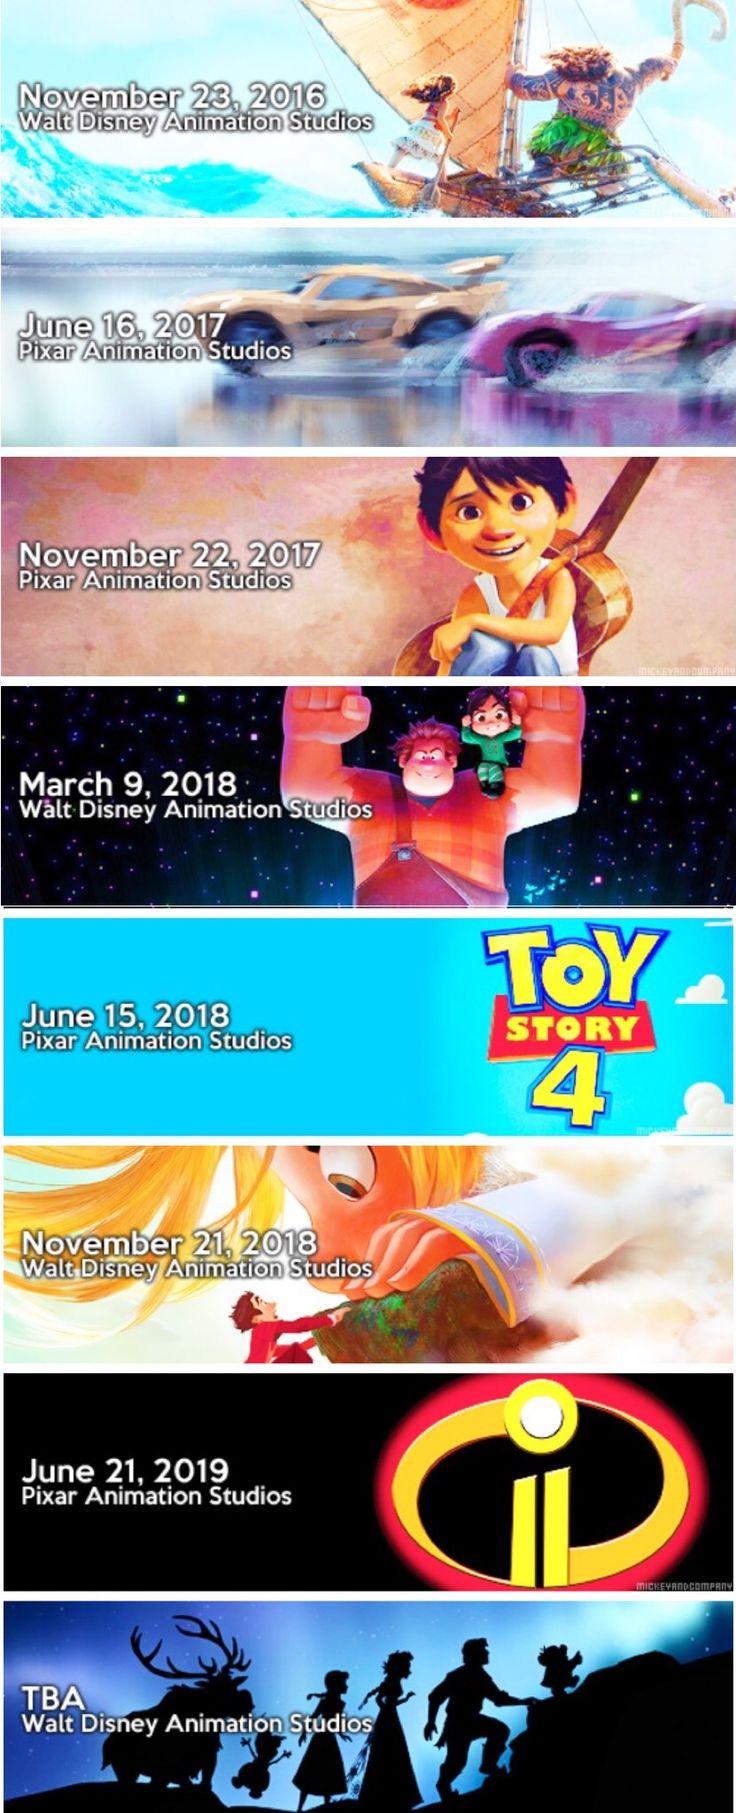 Upcoming Disney and Pixar films...IM SO EXCITED AAAAAAAAAH